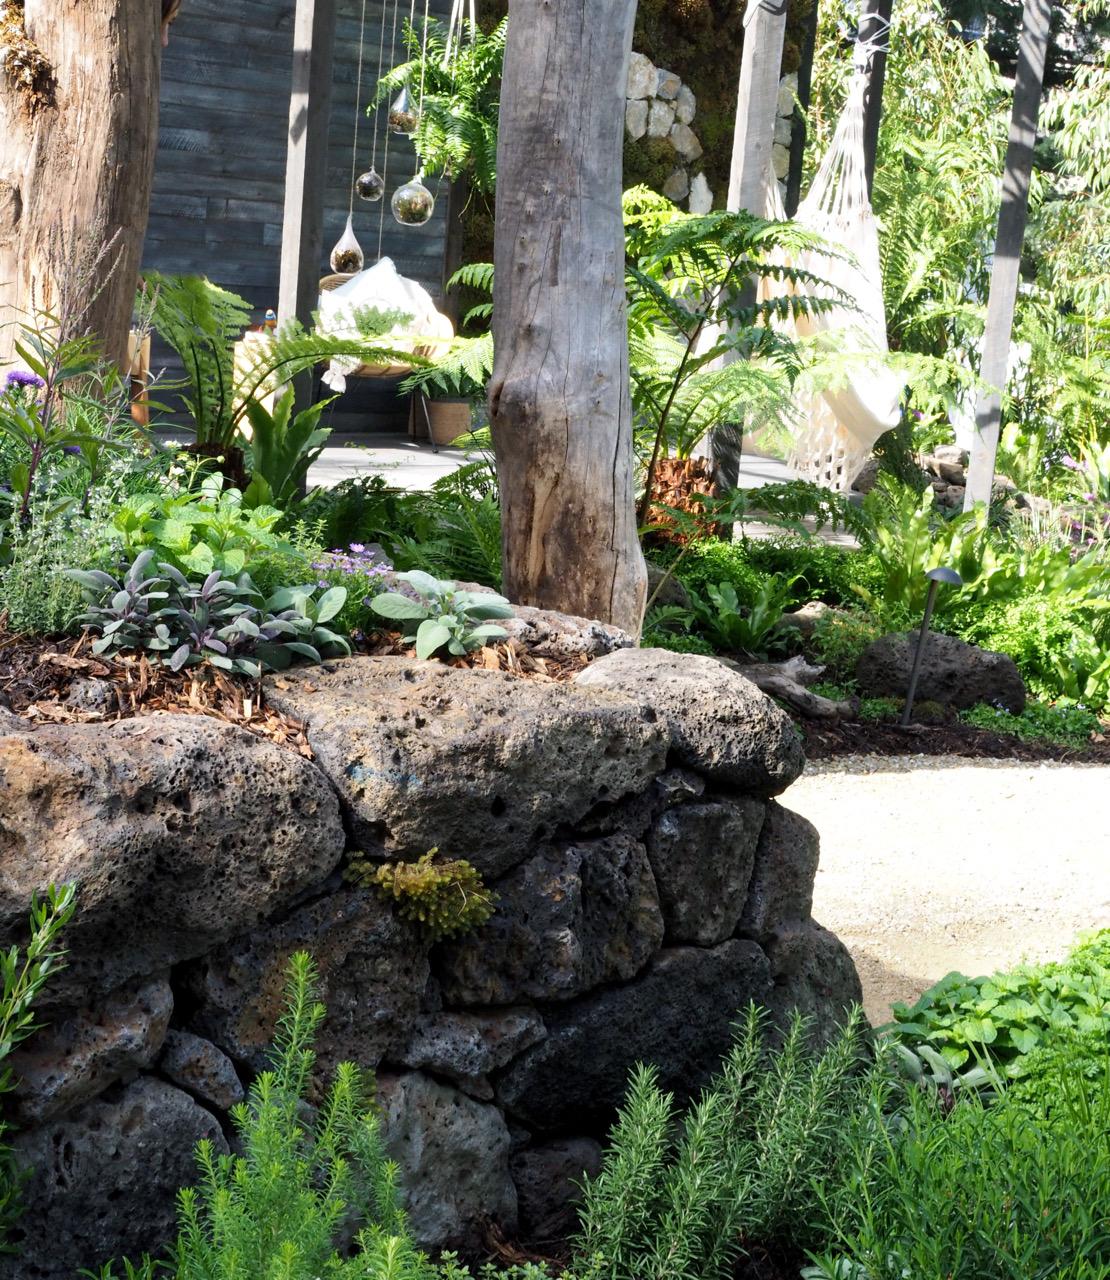 stone_garden_beds_melbourne.jpg